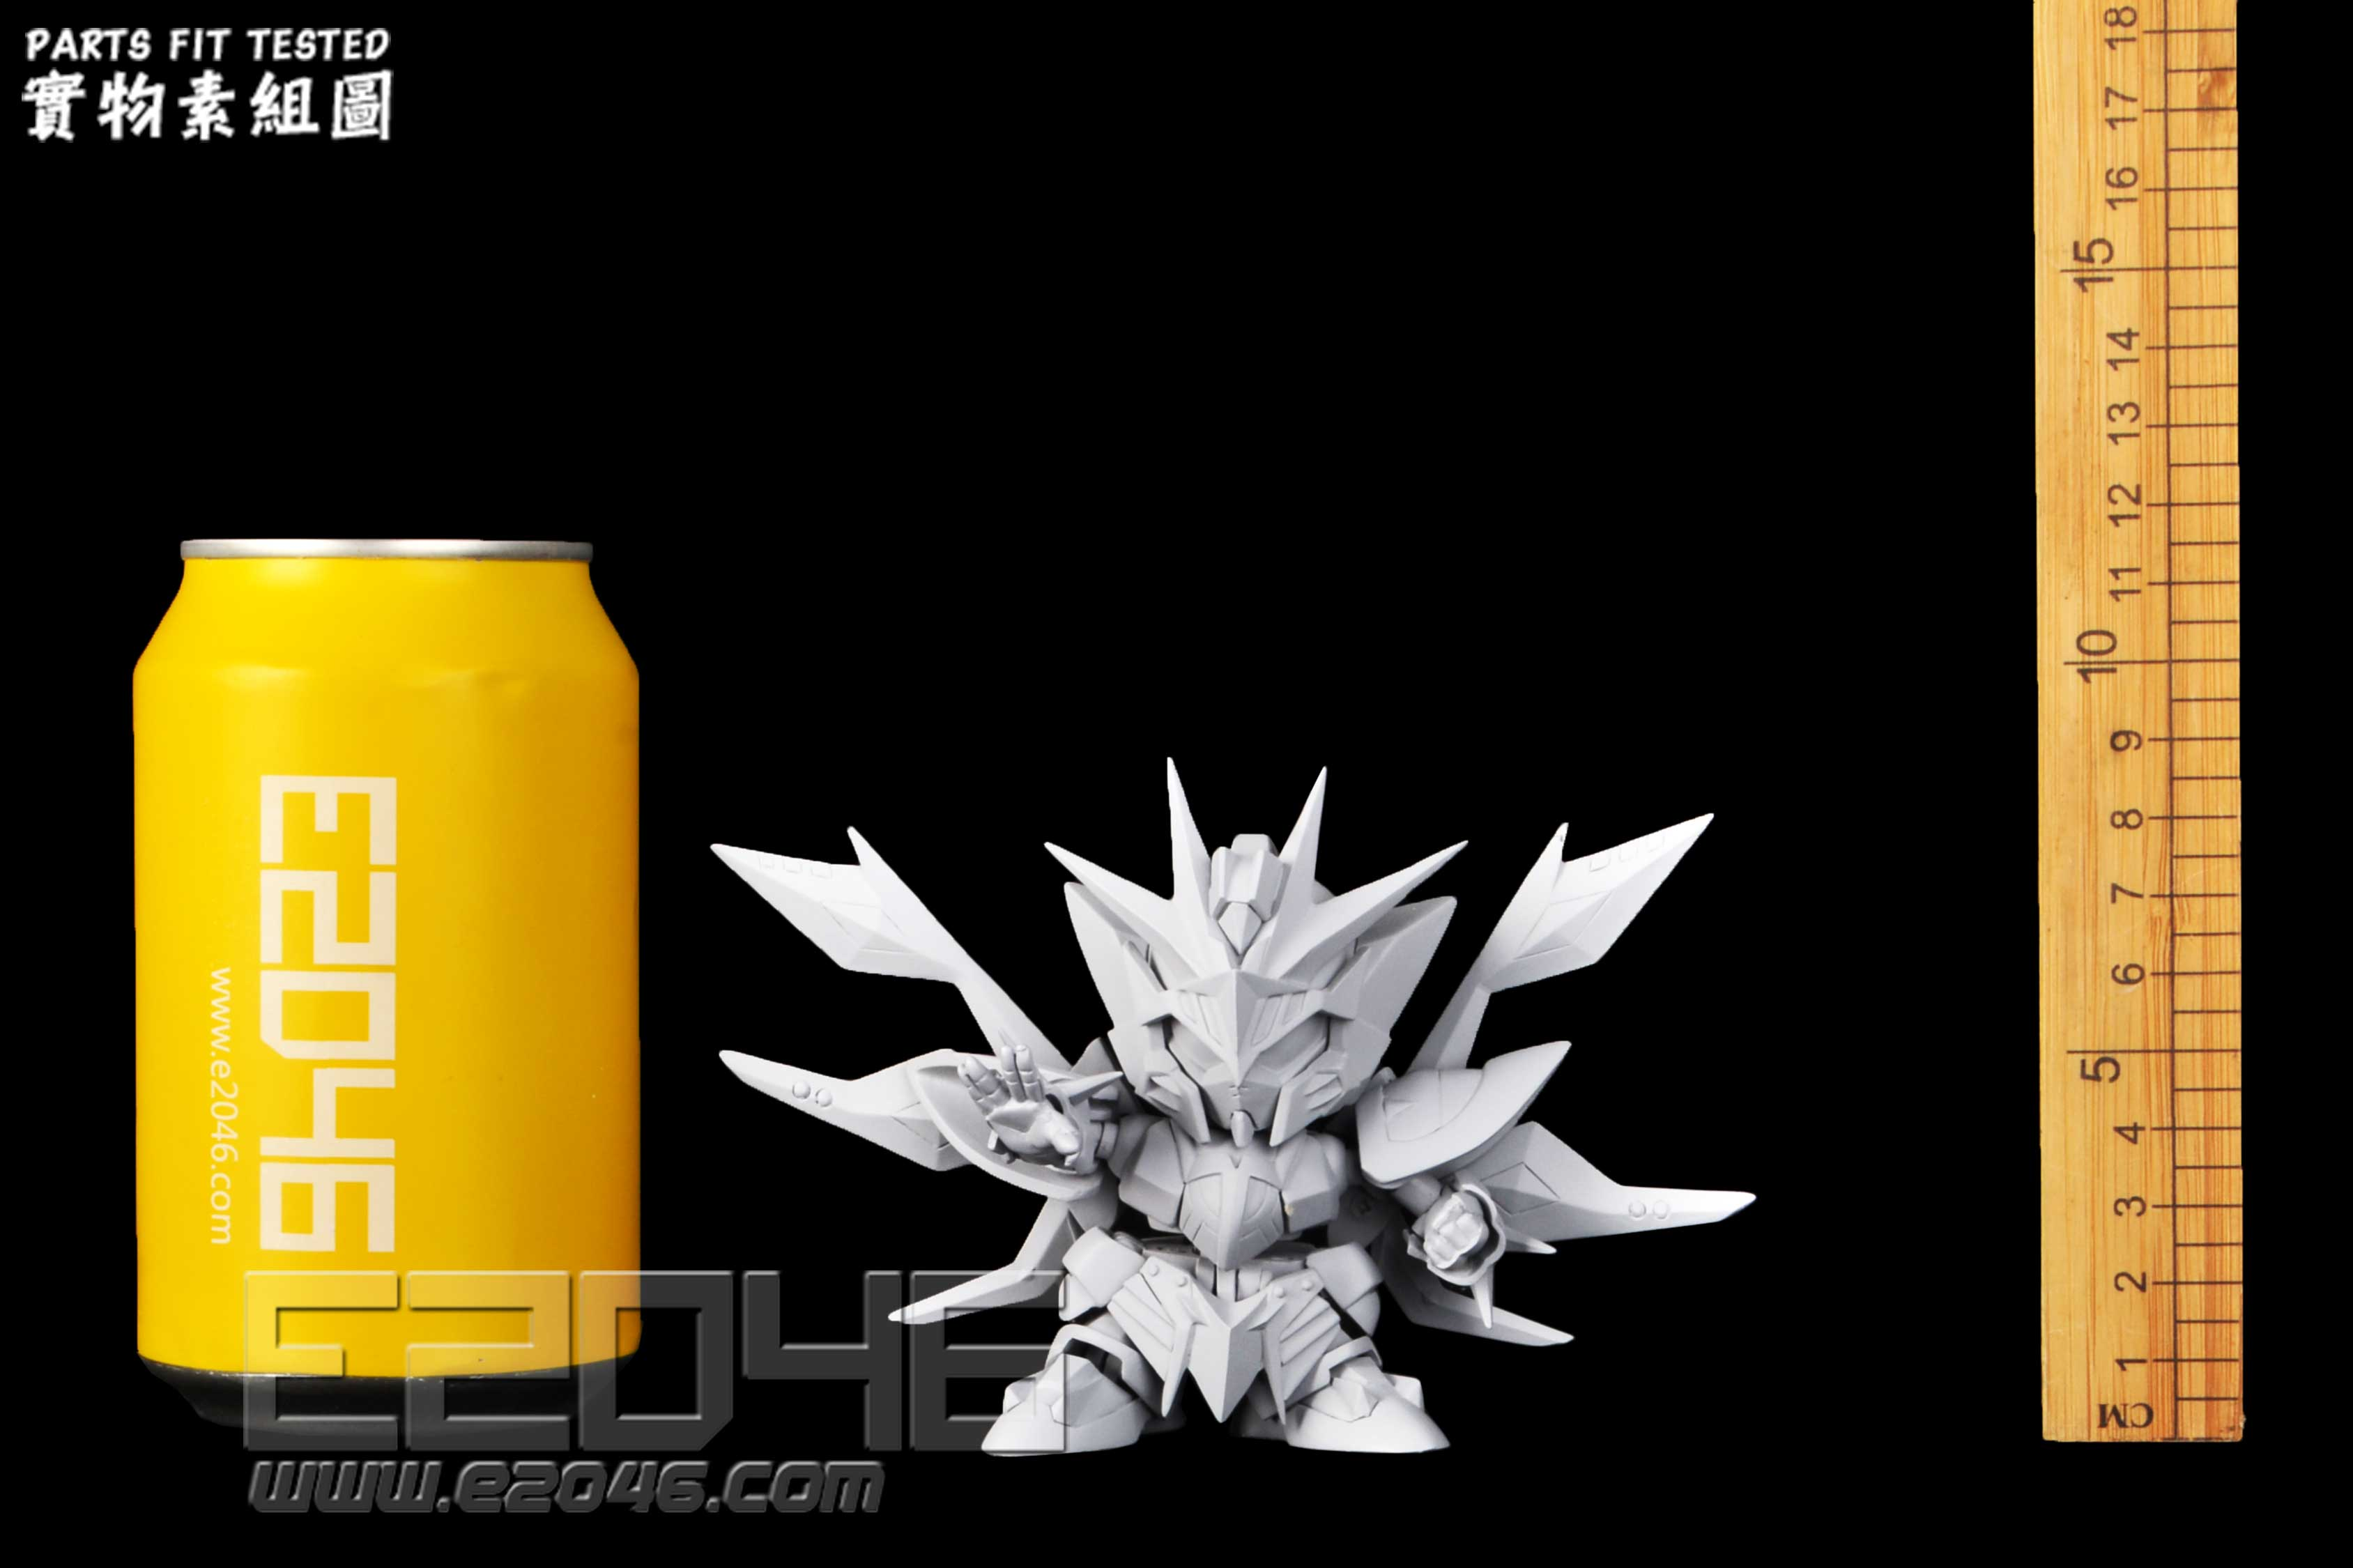 SD Sun Knight